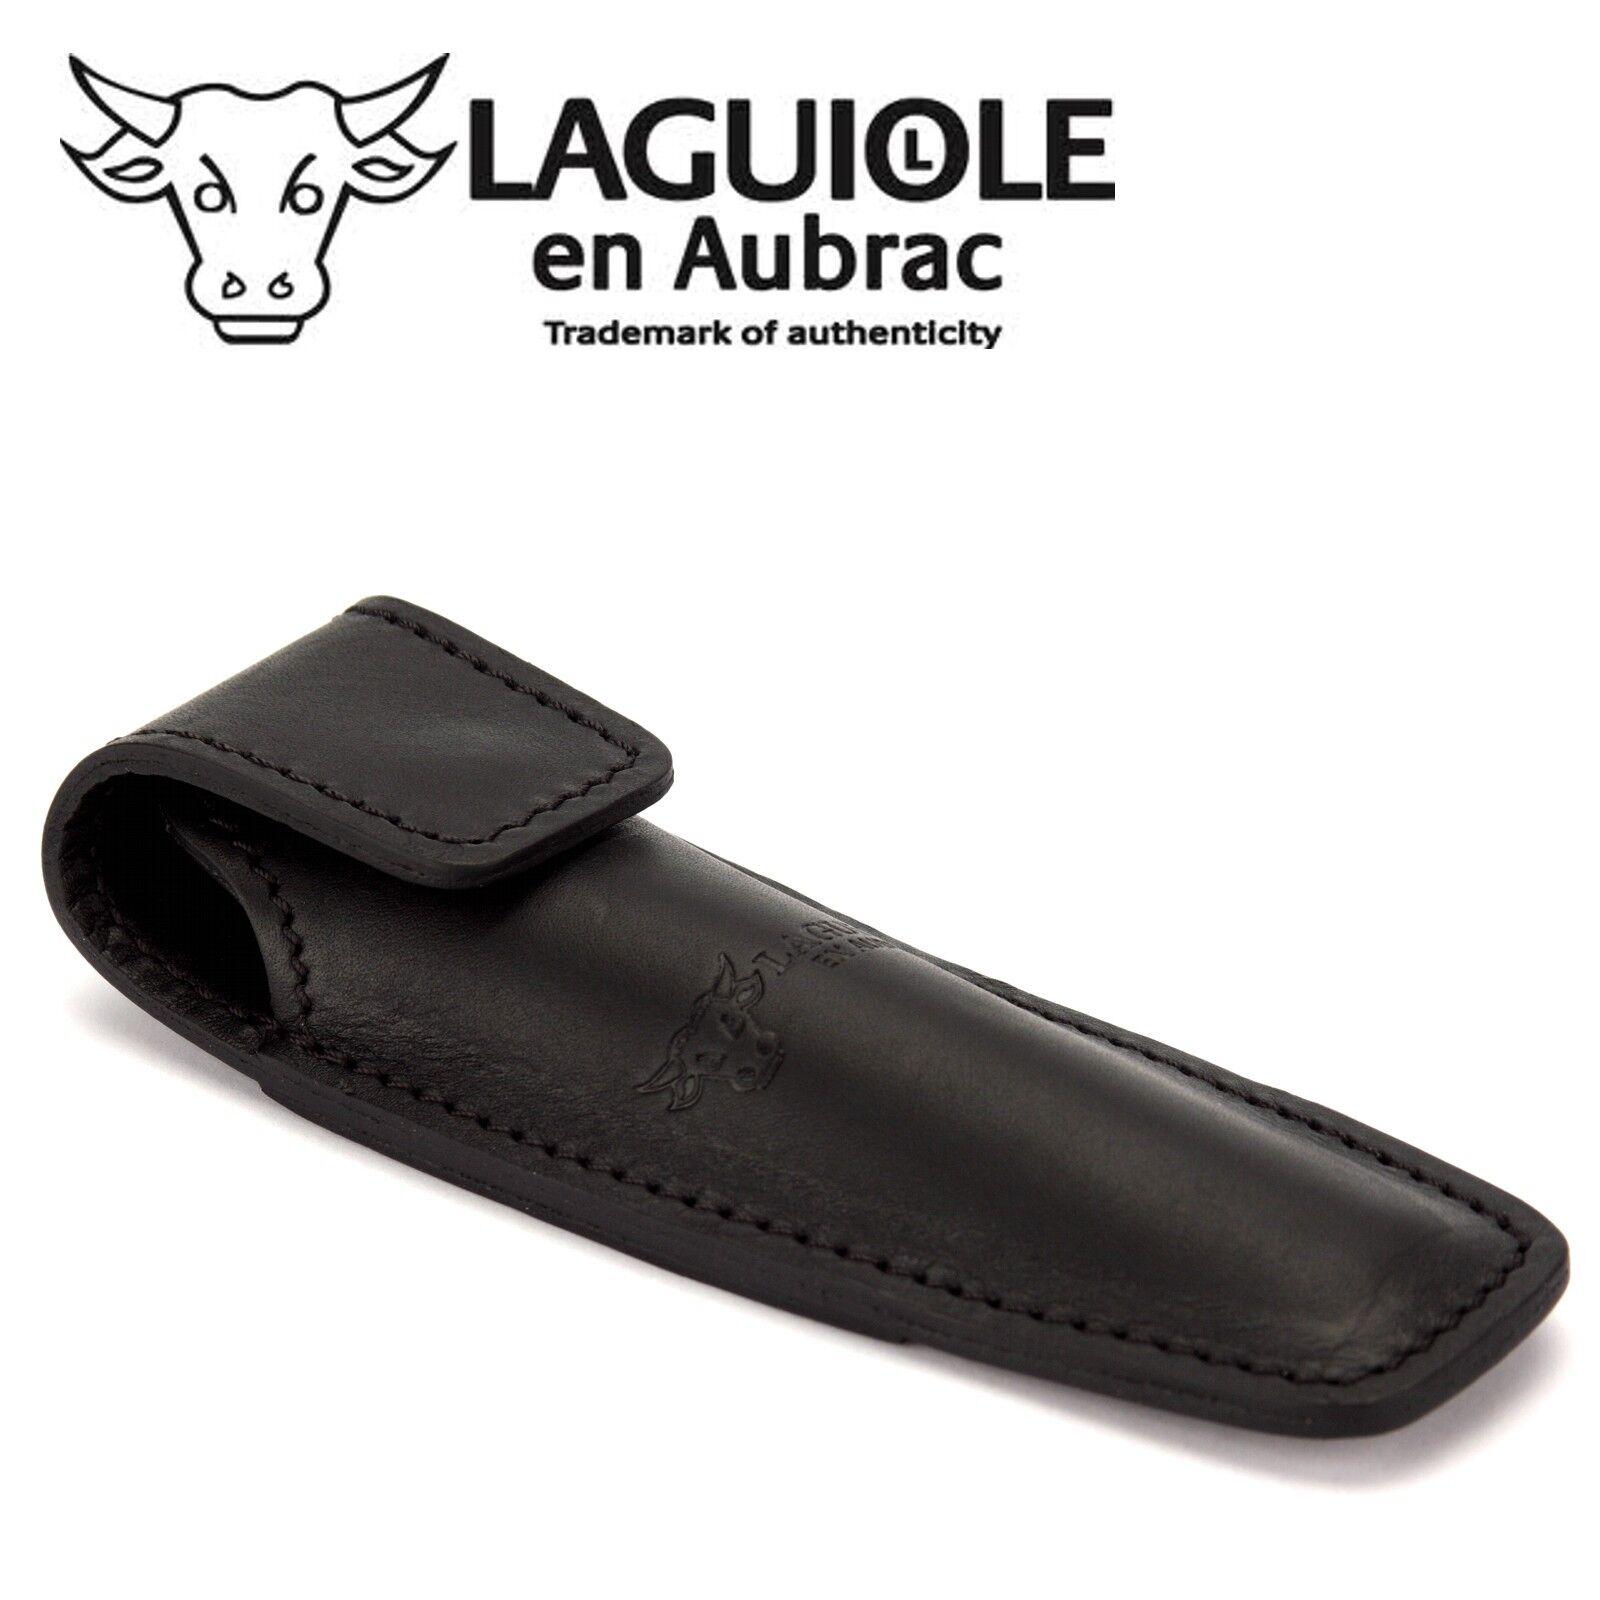 Laguiole en Aubrac ECA Gürteletui schwarz Leder Taschenmesser Messer Etui Tasche